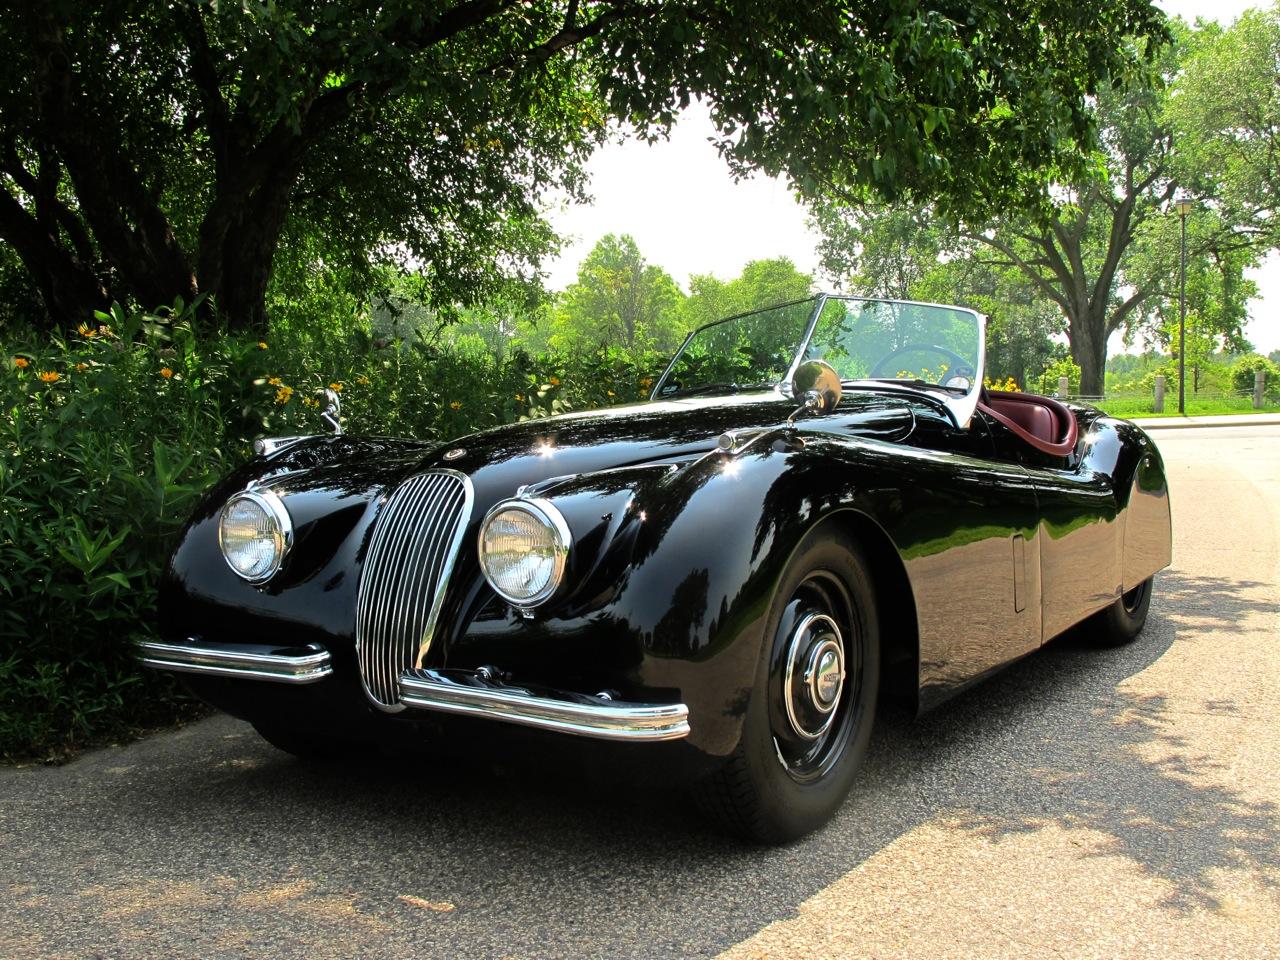 Cars Jlr Classics Wiring Diagrams 1957 Jaguar Xk140 1953 Xk120